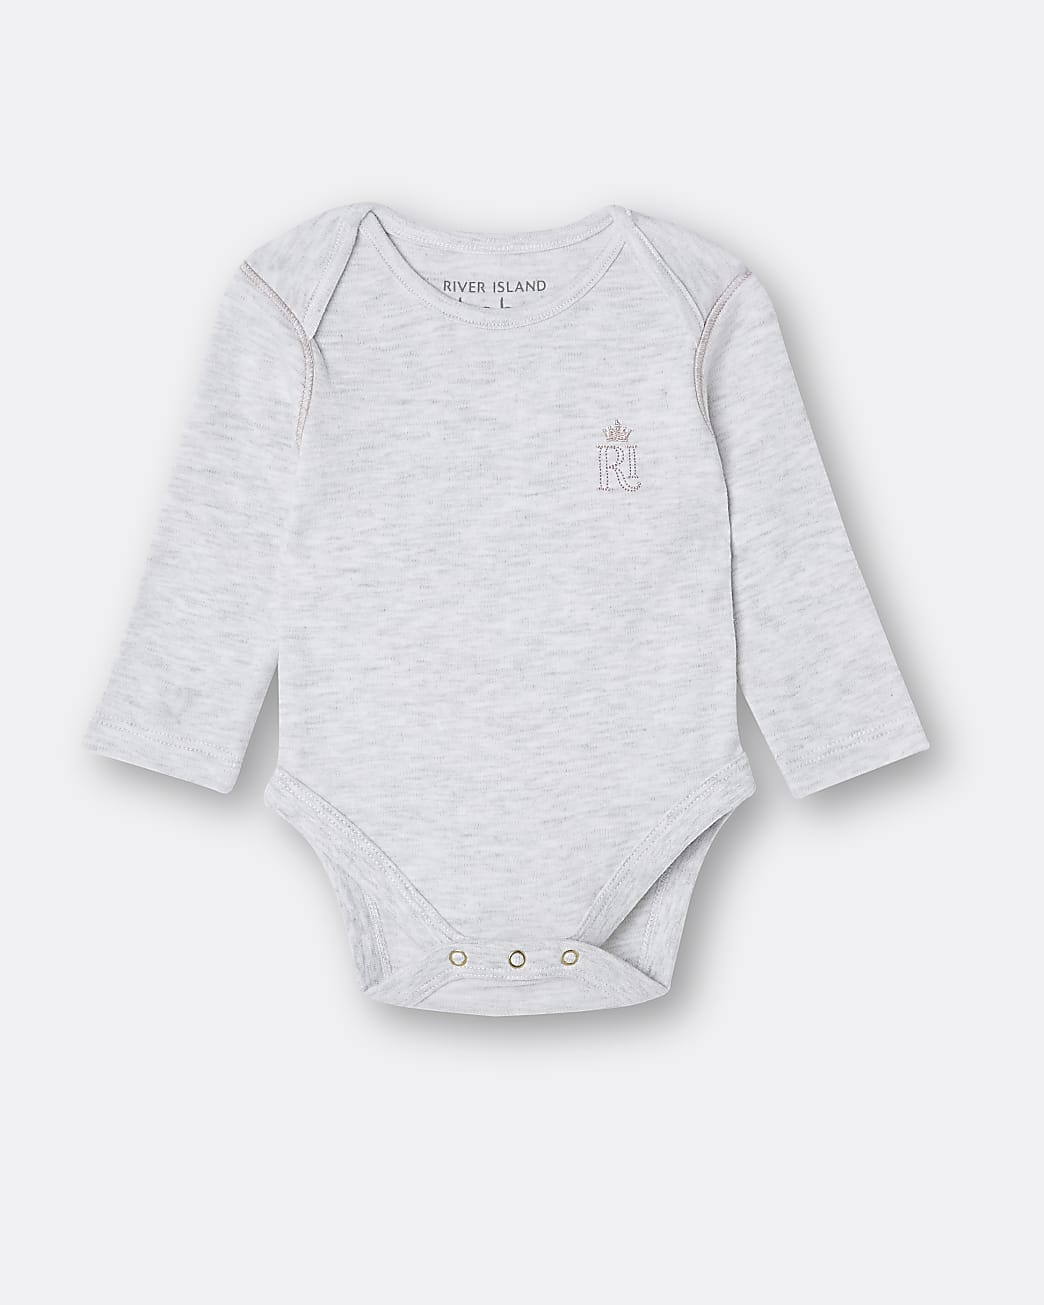 Baby grey RI embroidered babygrow